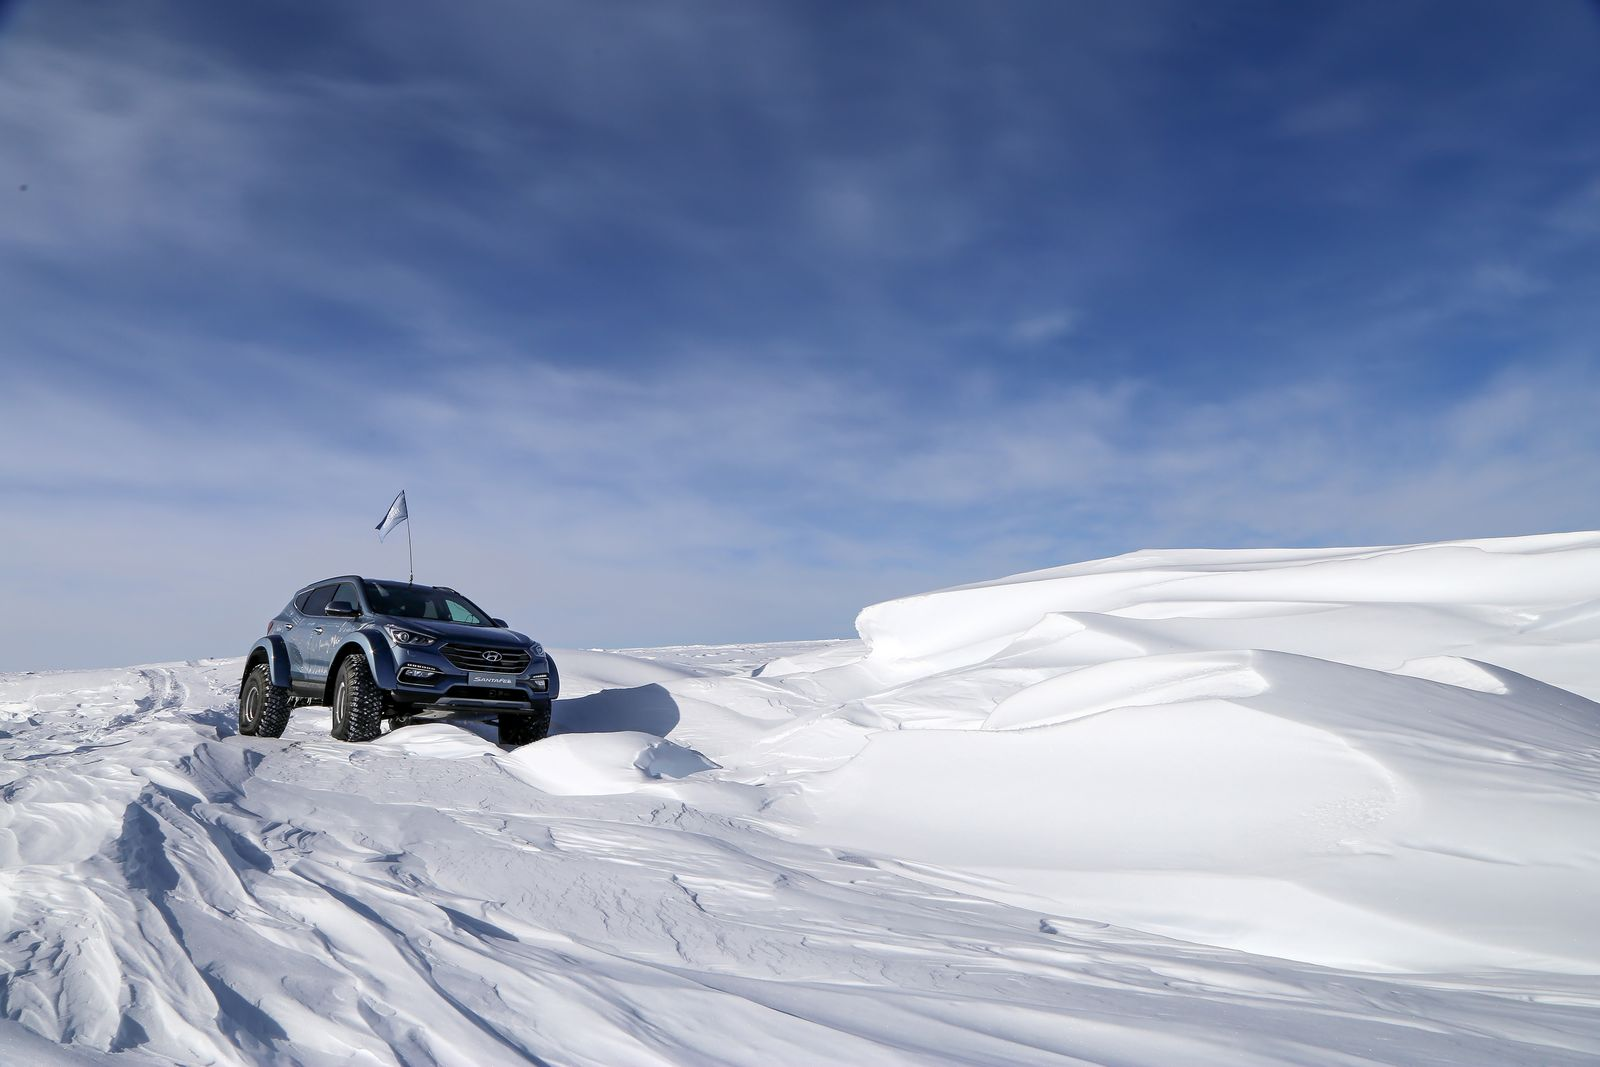 Honda Santa Fe >> Souped-Up Hyundai Santa Fe Drives Across Antarctica ...